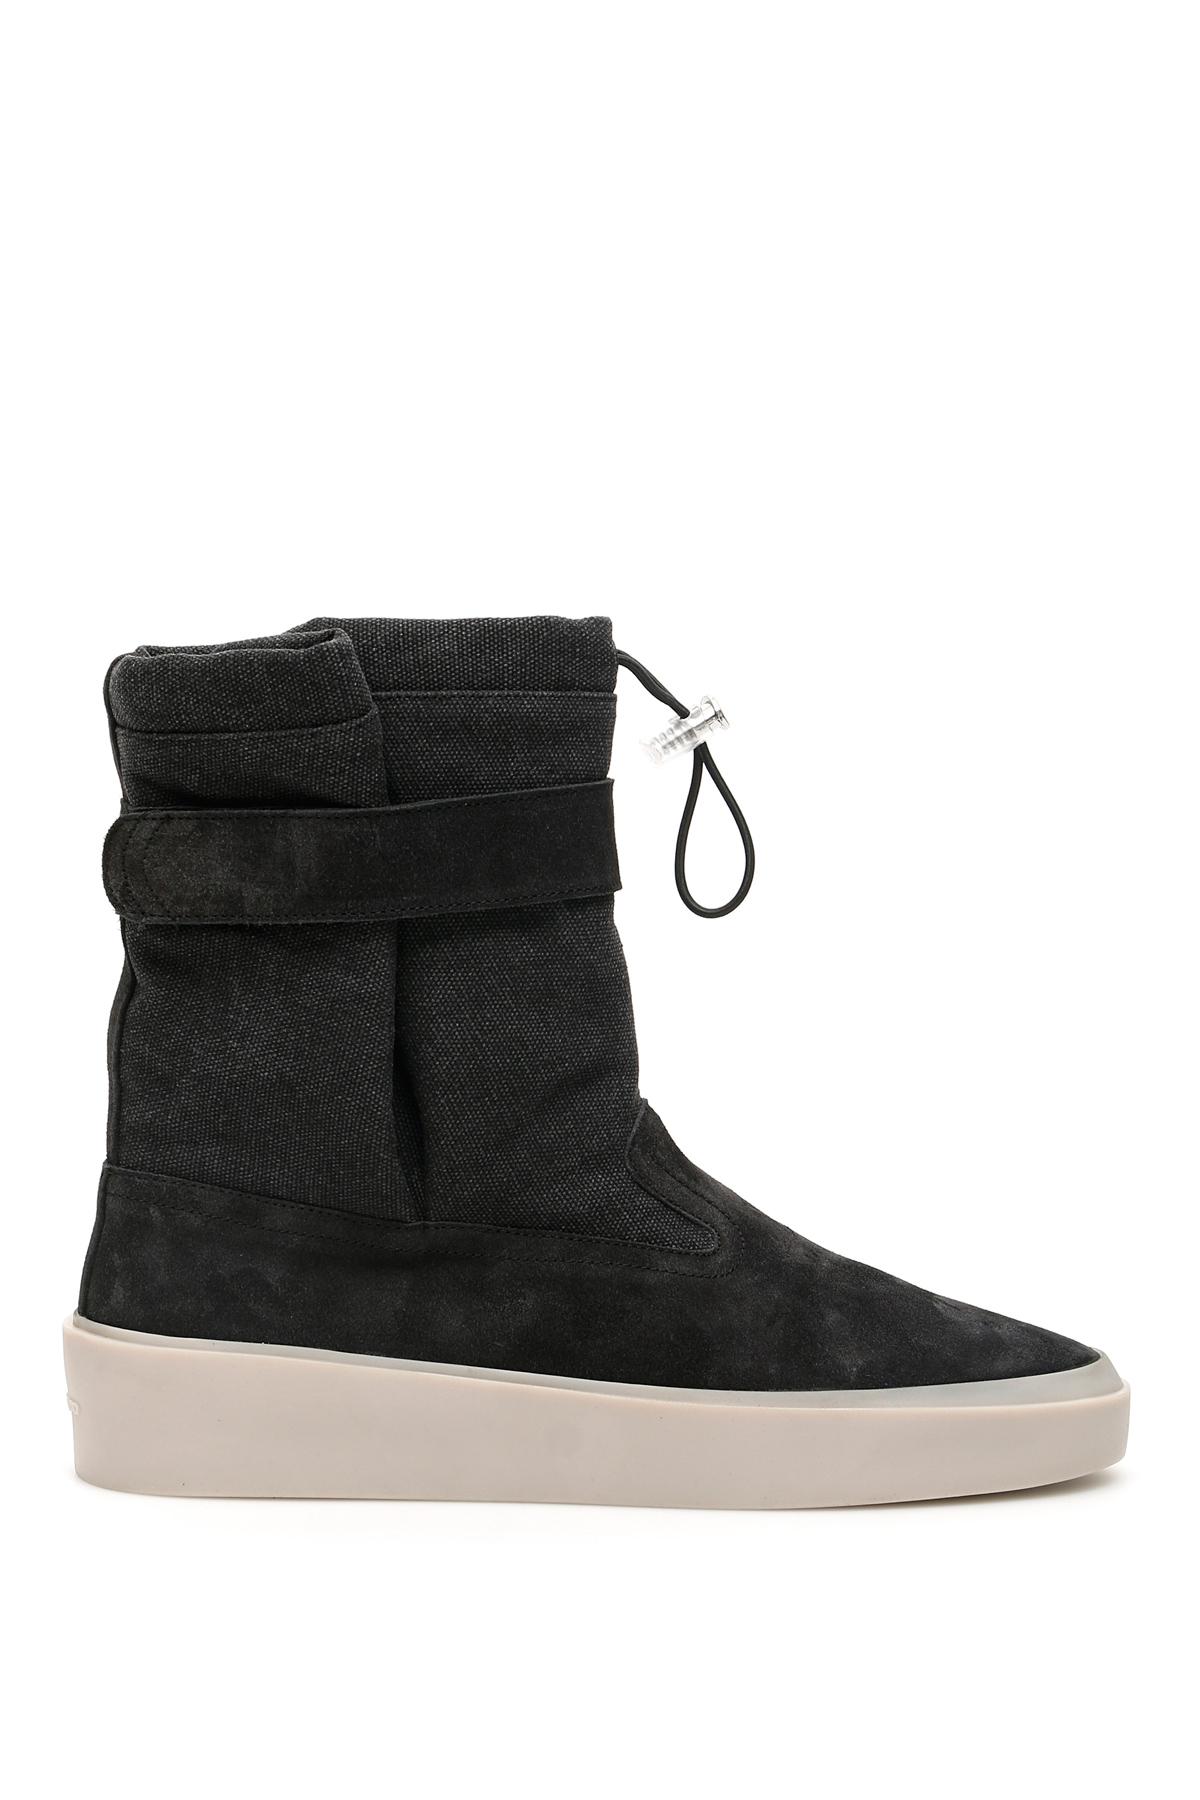 FEAR OF GOD SKI LOUNGE BOOTS 41 Grey, Black Cotton, Leather, Denim